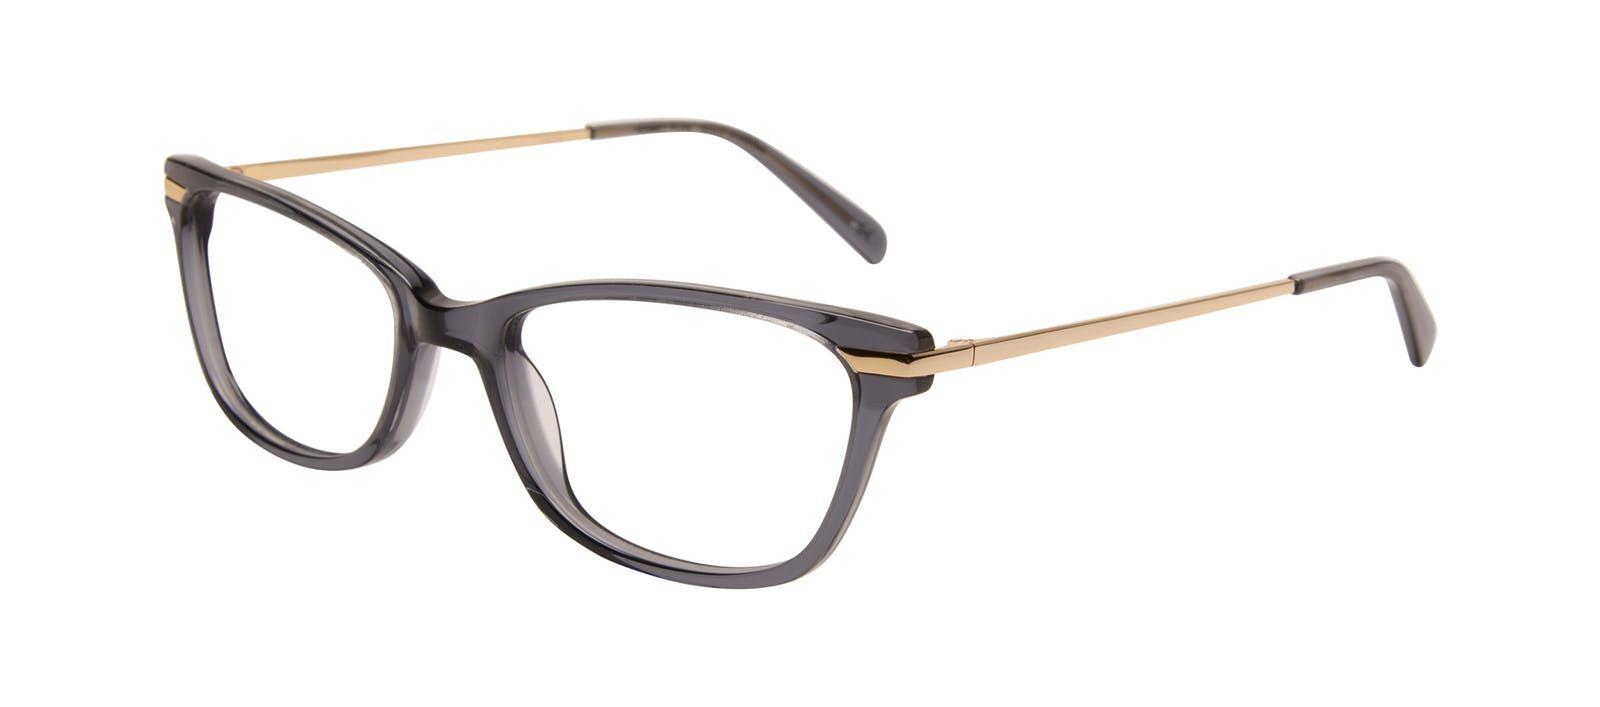 66b809fa1ccb Affordable fashion glasses rectangle eyeglasses women comet plus gold  shadow tilt jpg 1600x707 Pretty rectangle eyeglasses